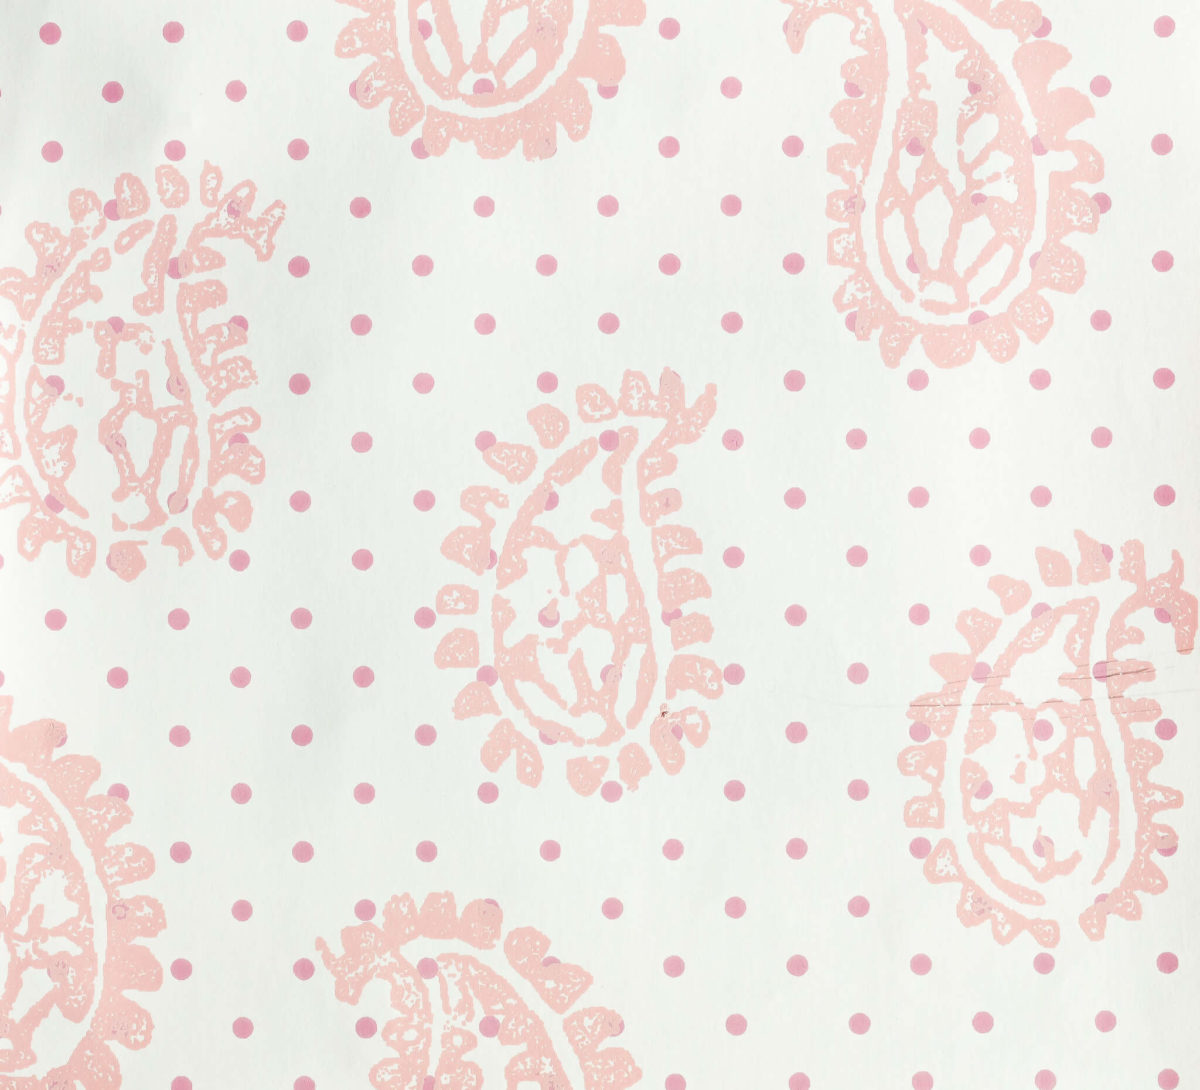 Firenze Pink with Dots Wallpaper